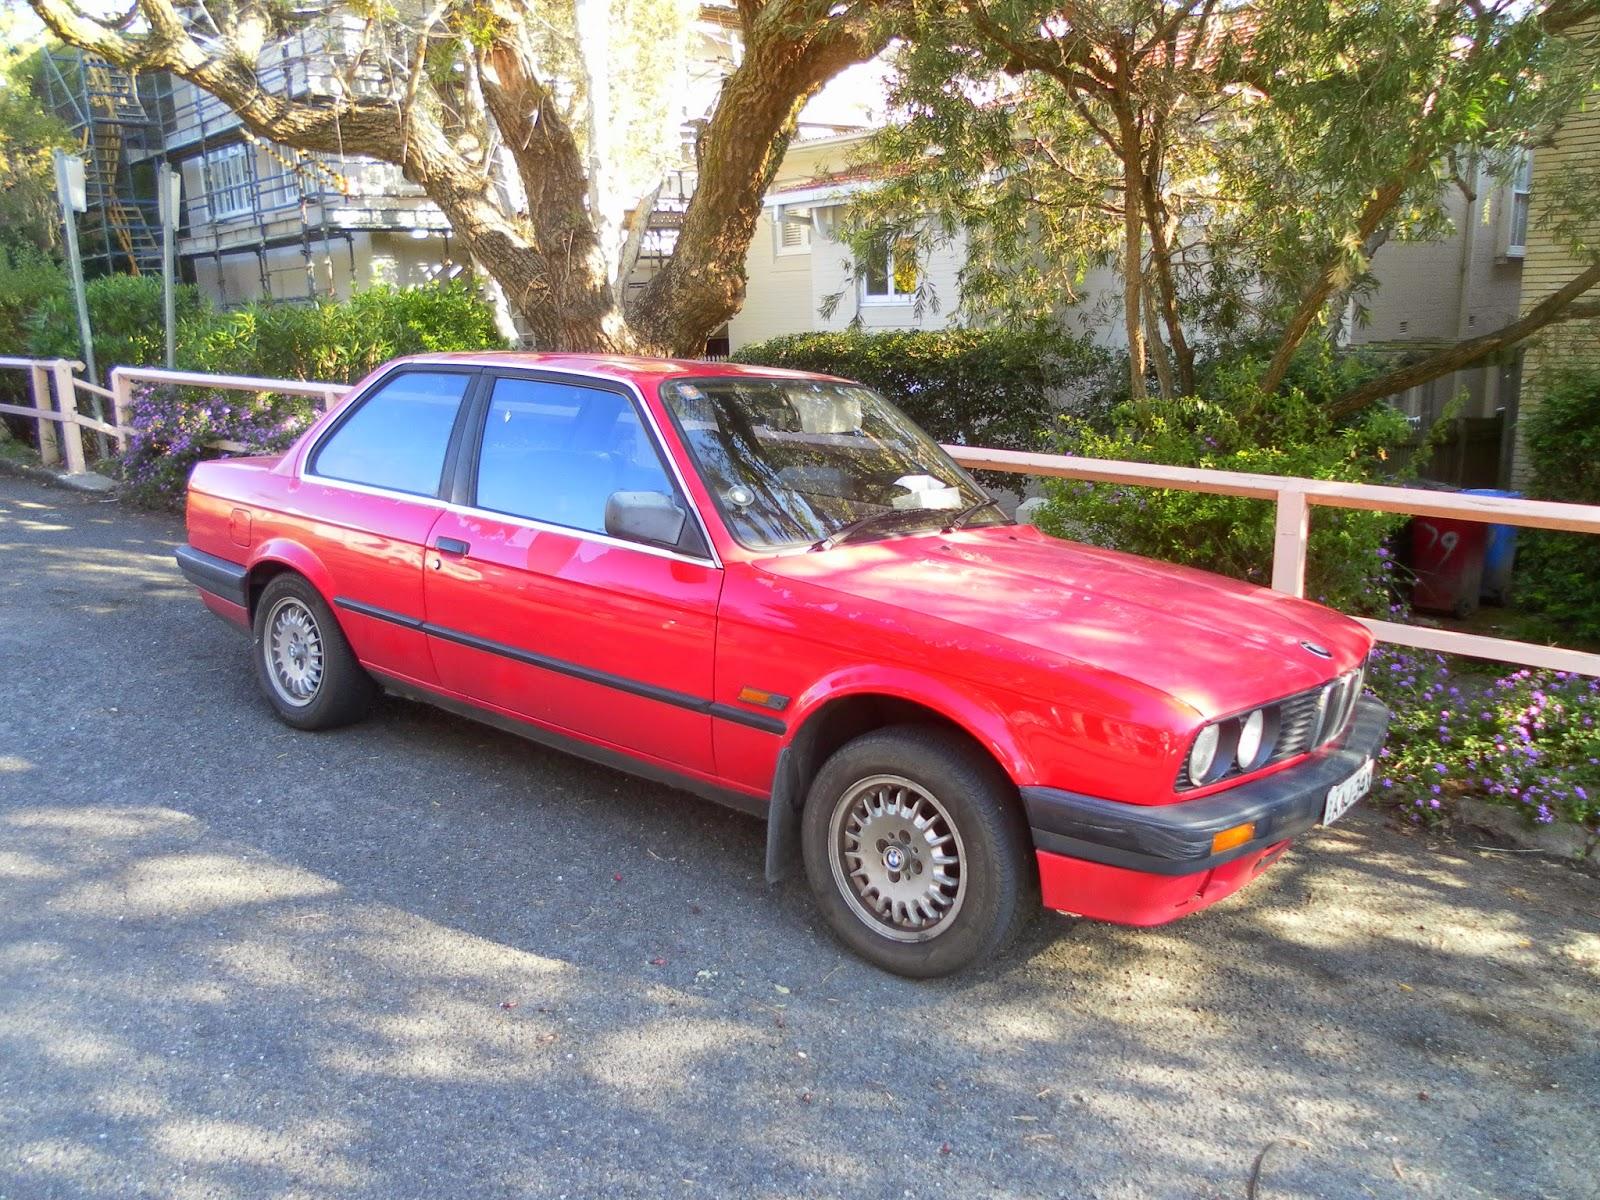 Aussie Old Parked Cars BMW I Door Sedan E - Bmw 318i 2 door